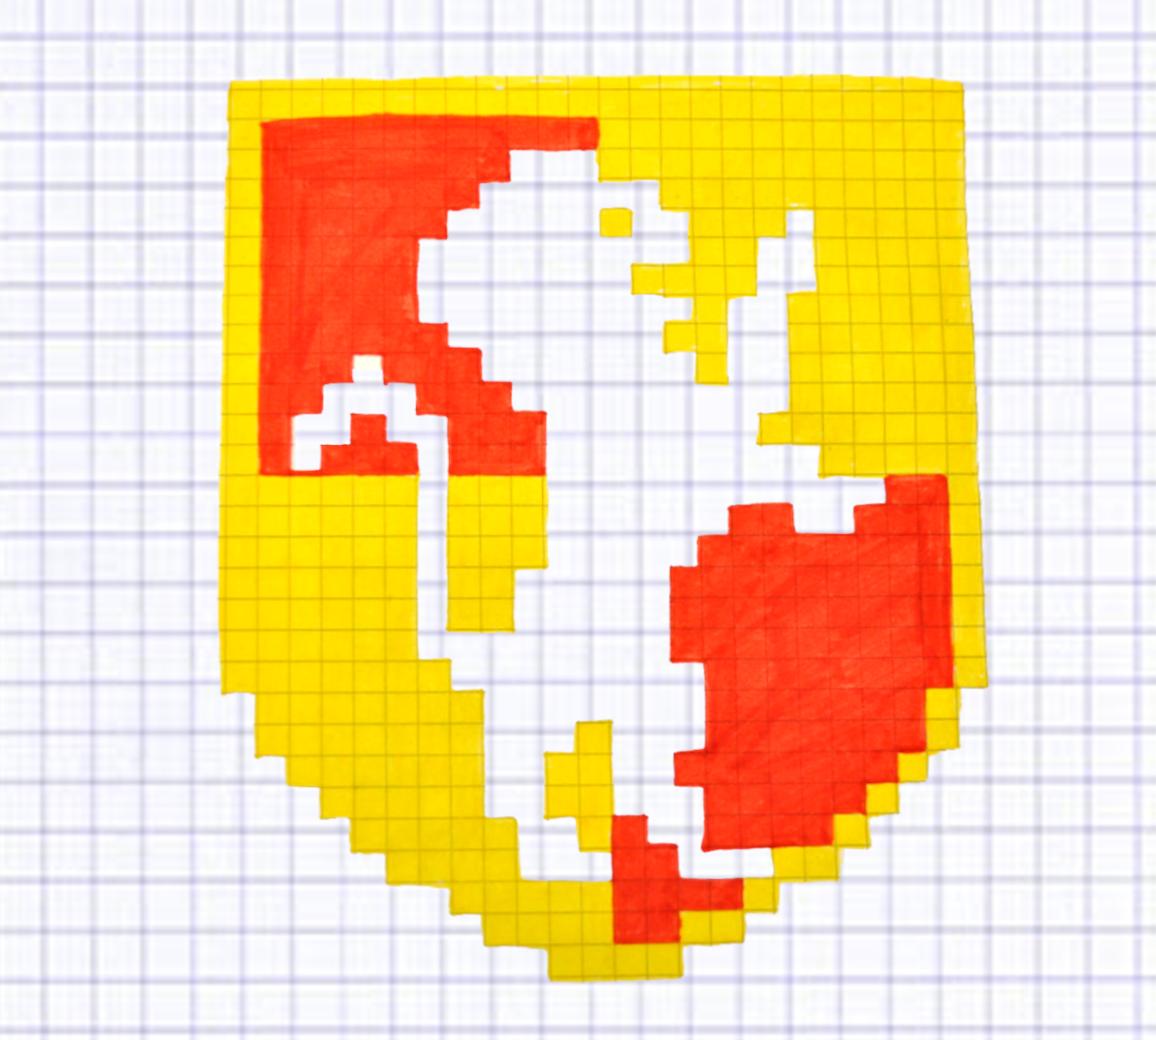 Pixel Art Gryffondor Super Beau En 2020 Pixel Art Pixel Art Harry Potter Coloriage Pixel Art